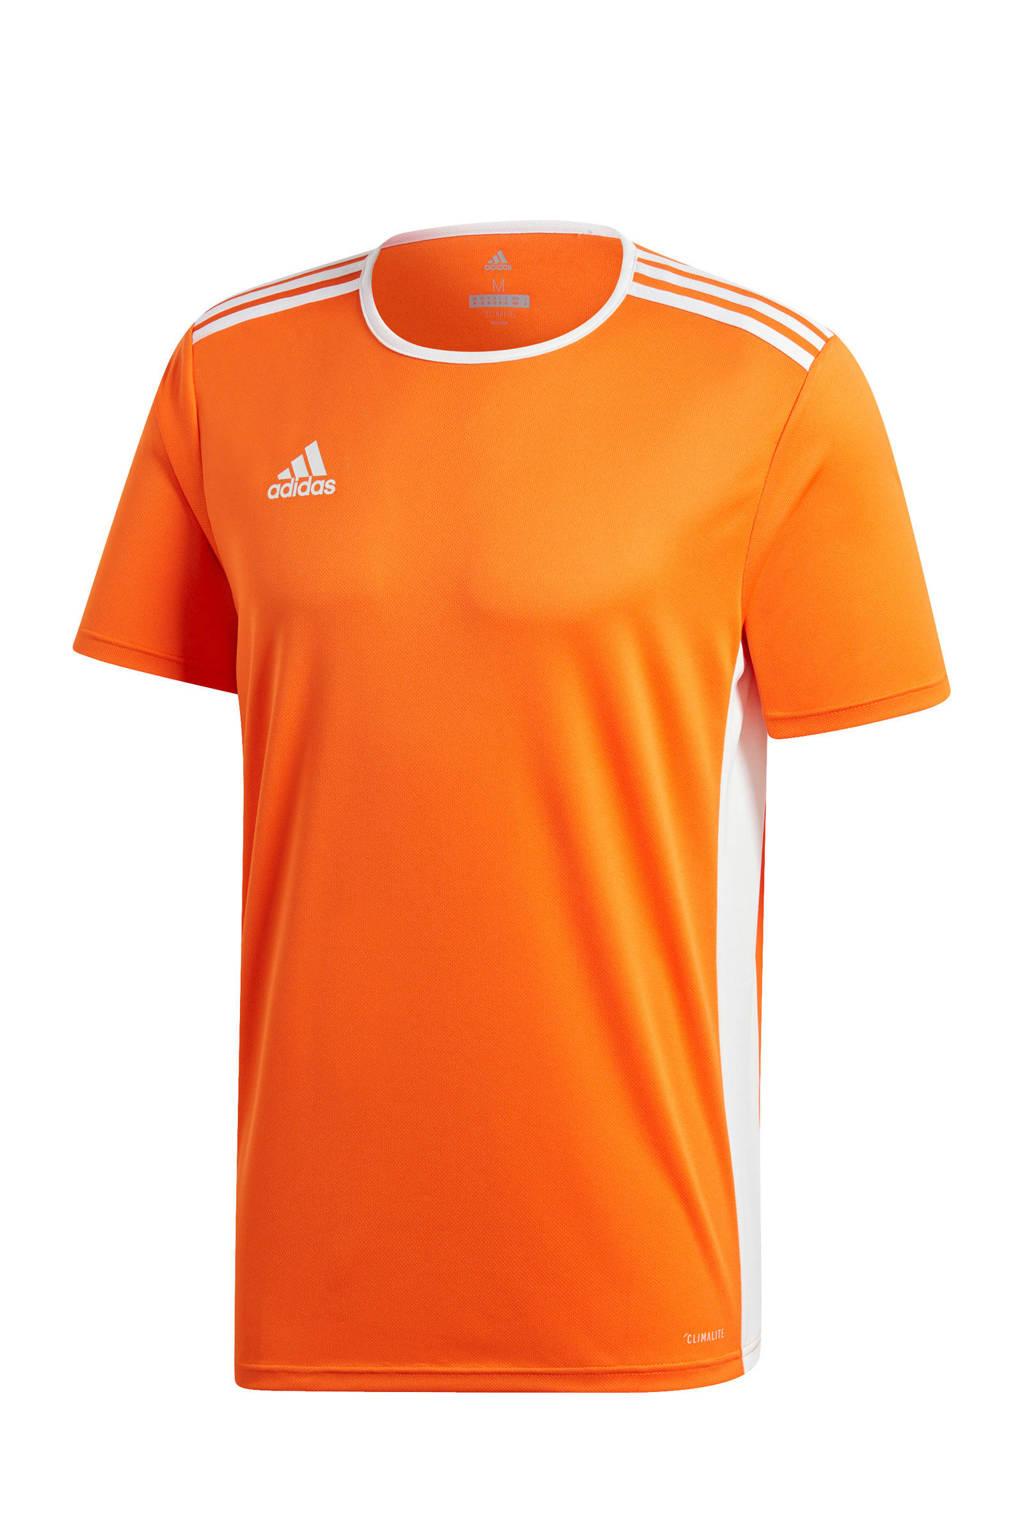 adidas   sport T-shirt Entrada oranje, Oranje/wit